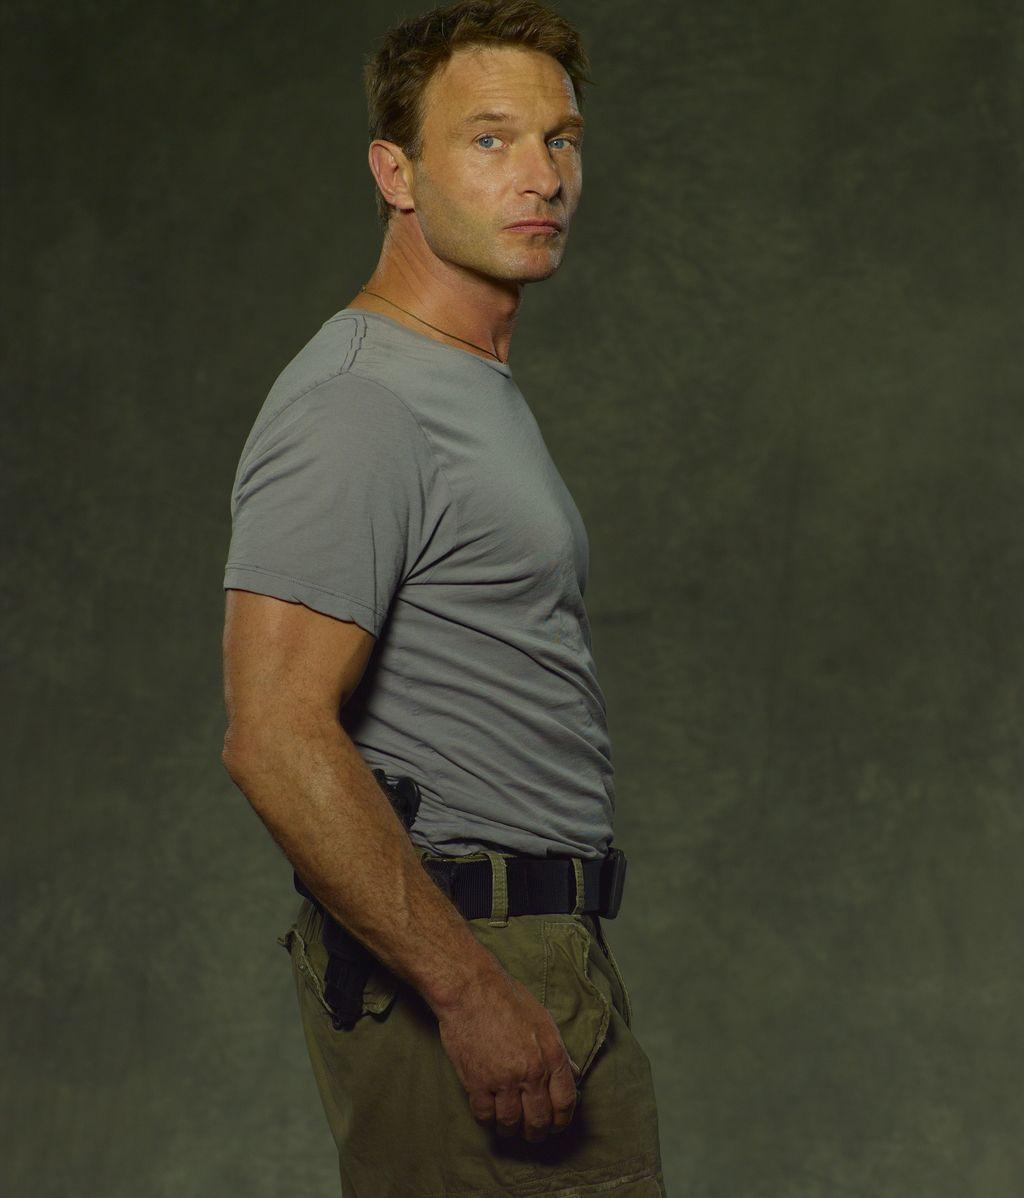 Thomas Krestchmann es el capitán Kurt Brynildson